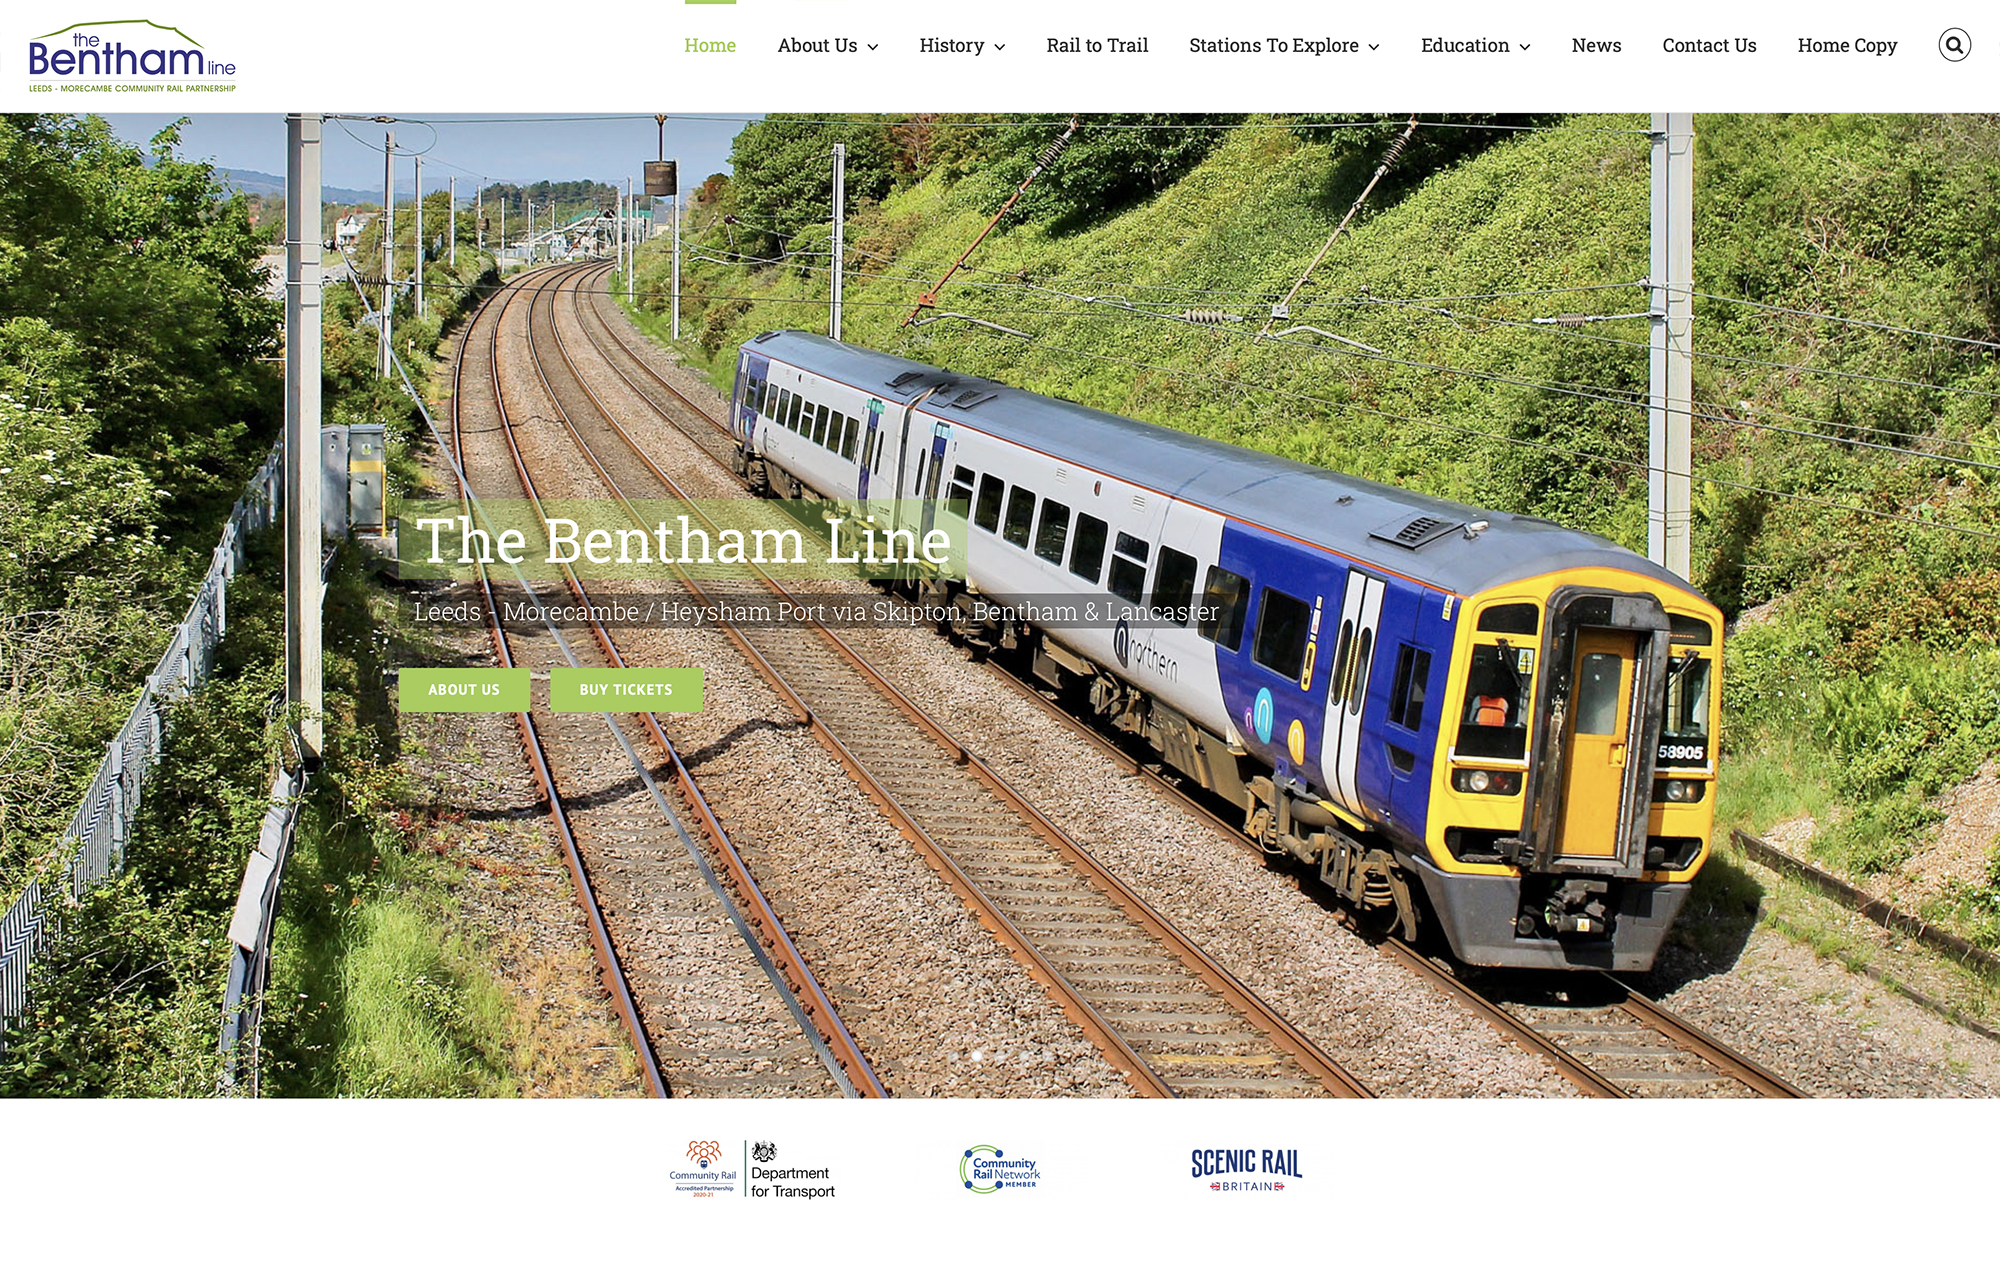 The Bentham Line website homepage